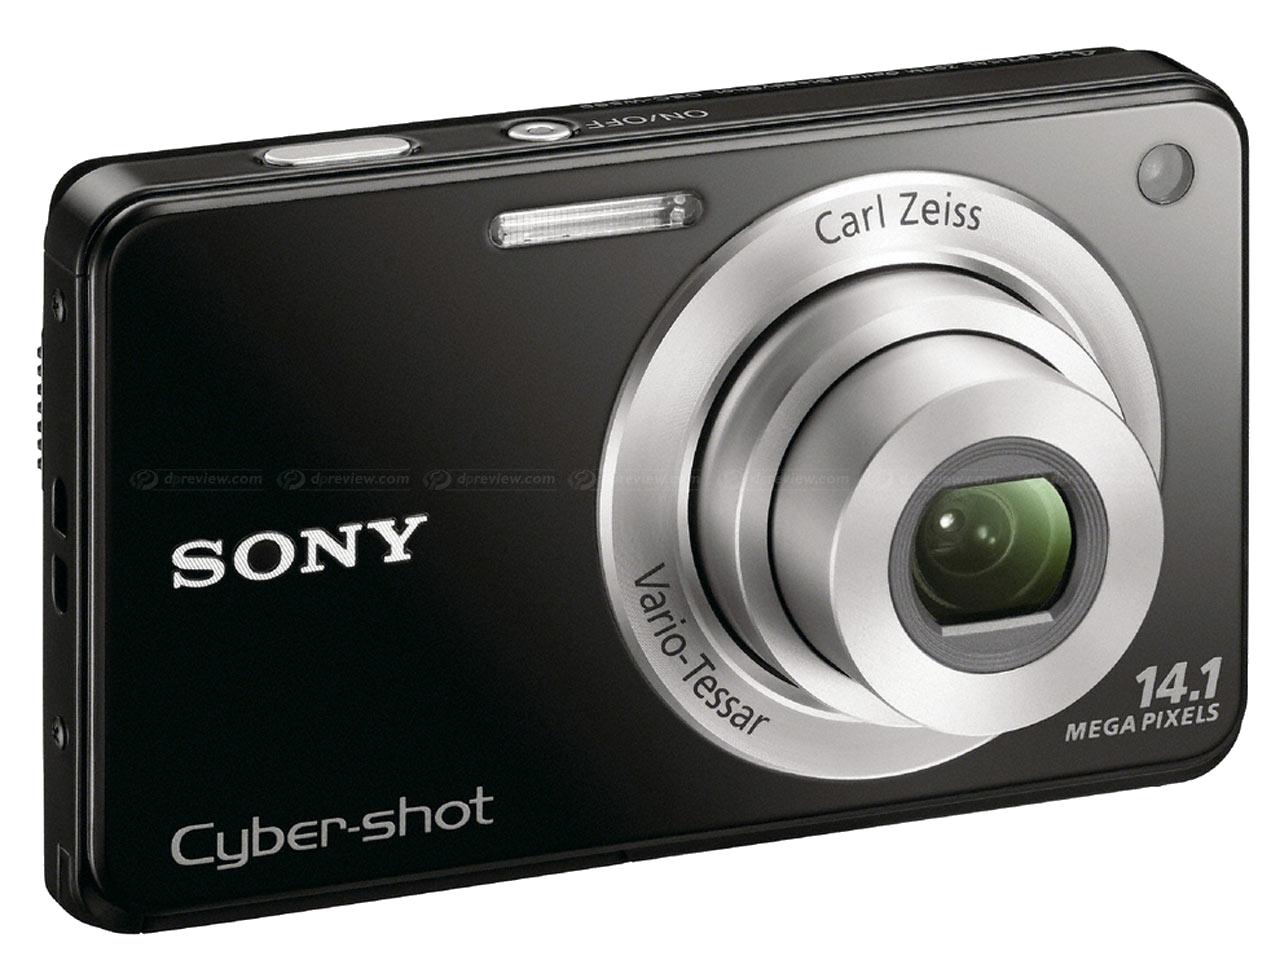 Camera clipart digital camera. Download sony hq png